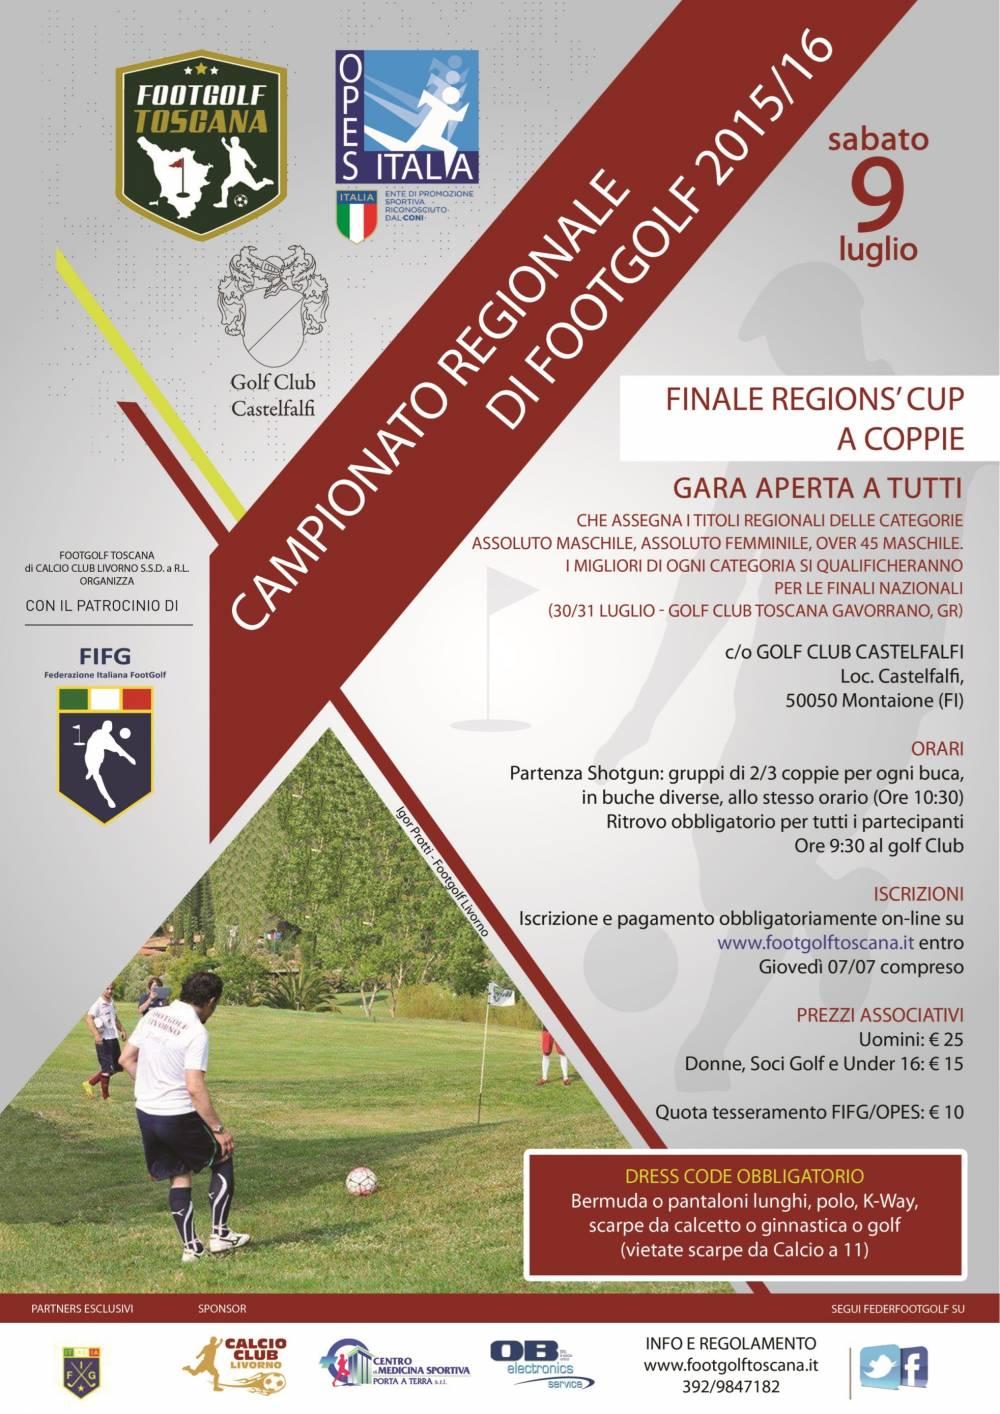 Locandina Castelfalfi 9-7-16 (1)